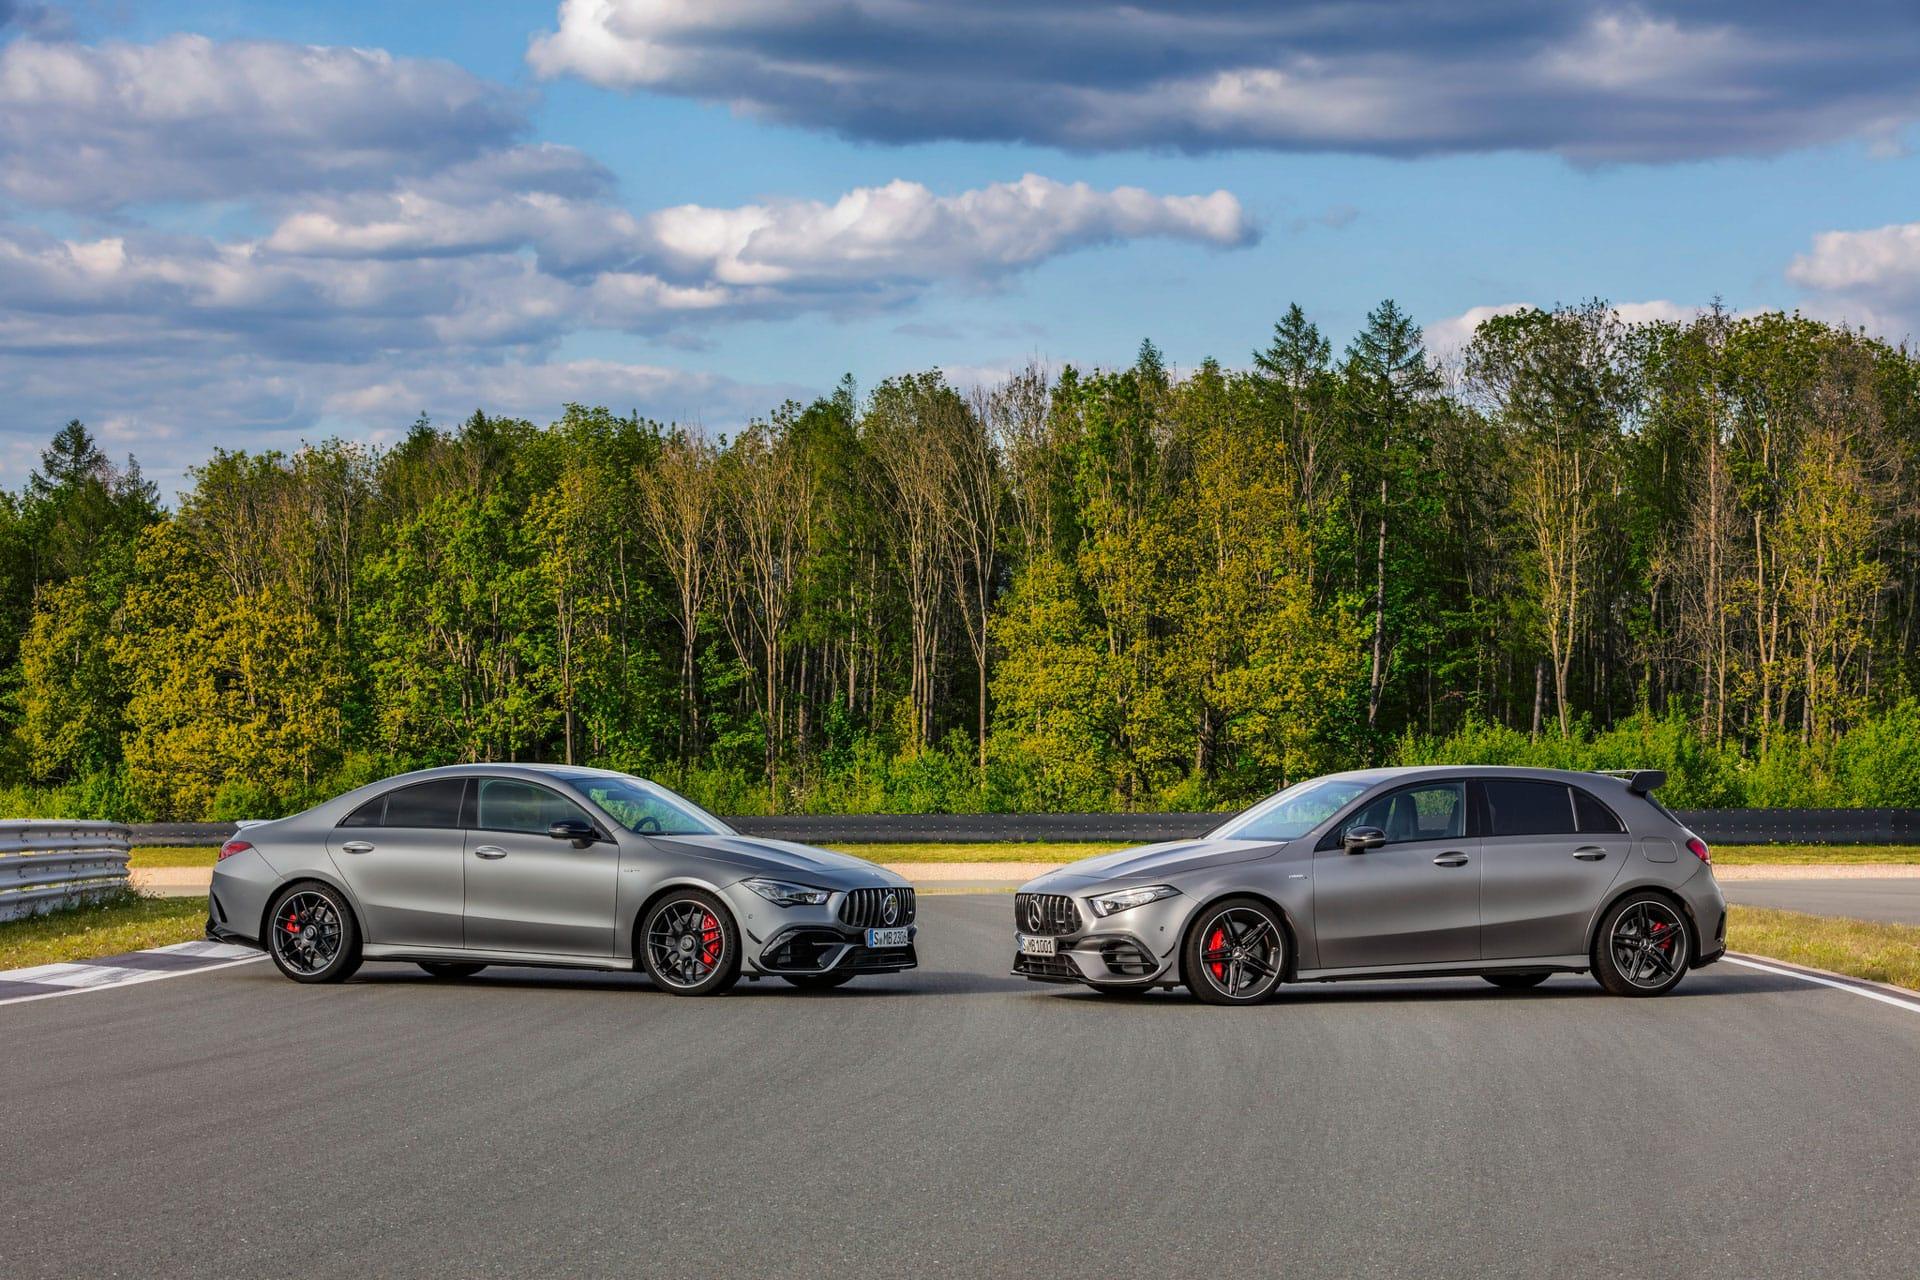 Офіційно представлені Mercedes–AMG A 45 4MATIC і CLA 45 4MATIC